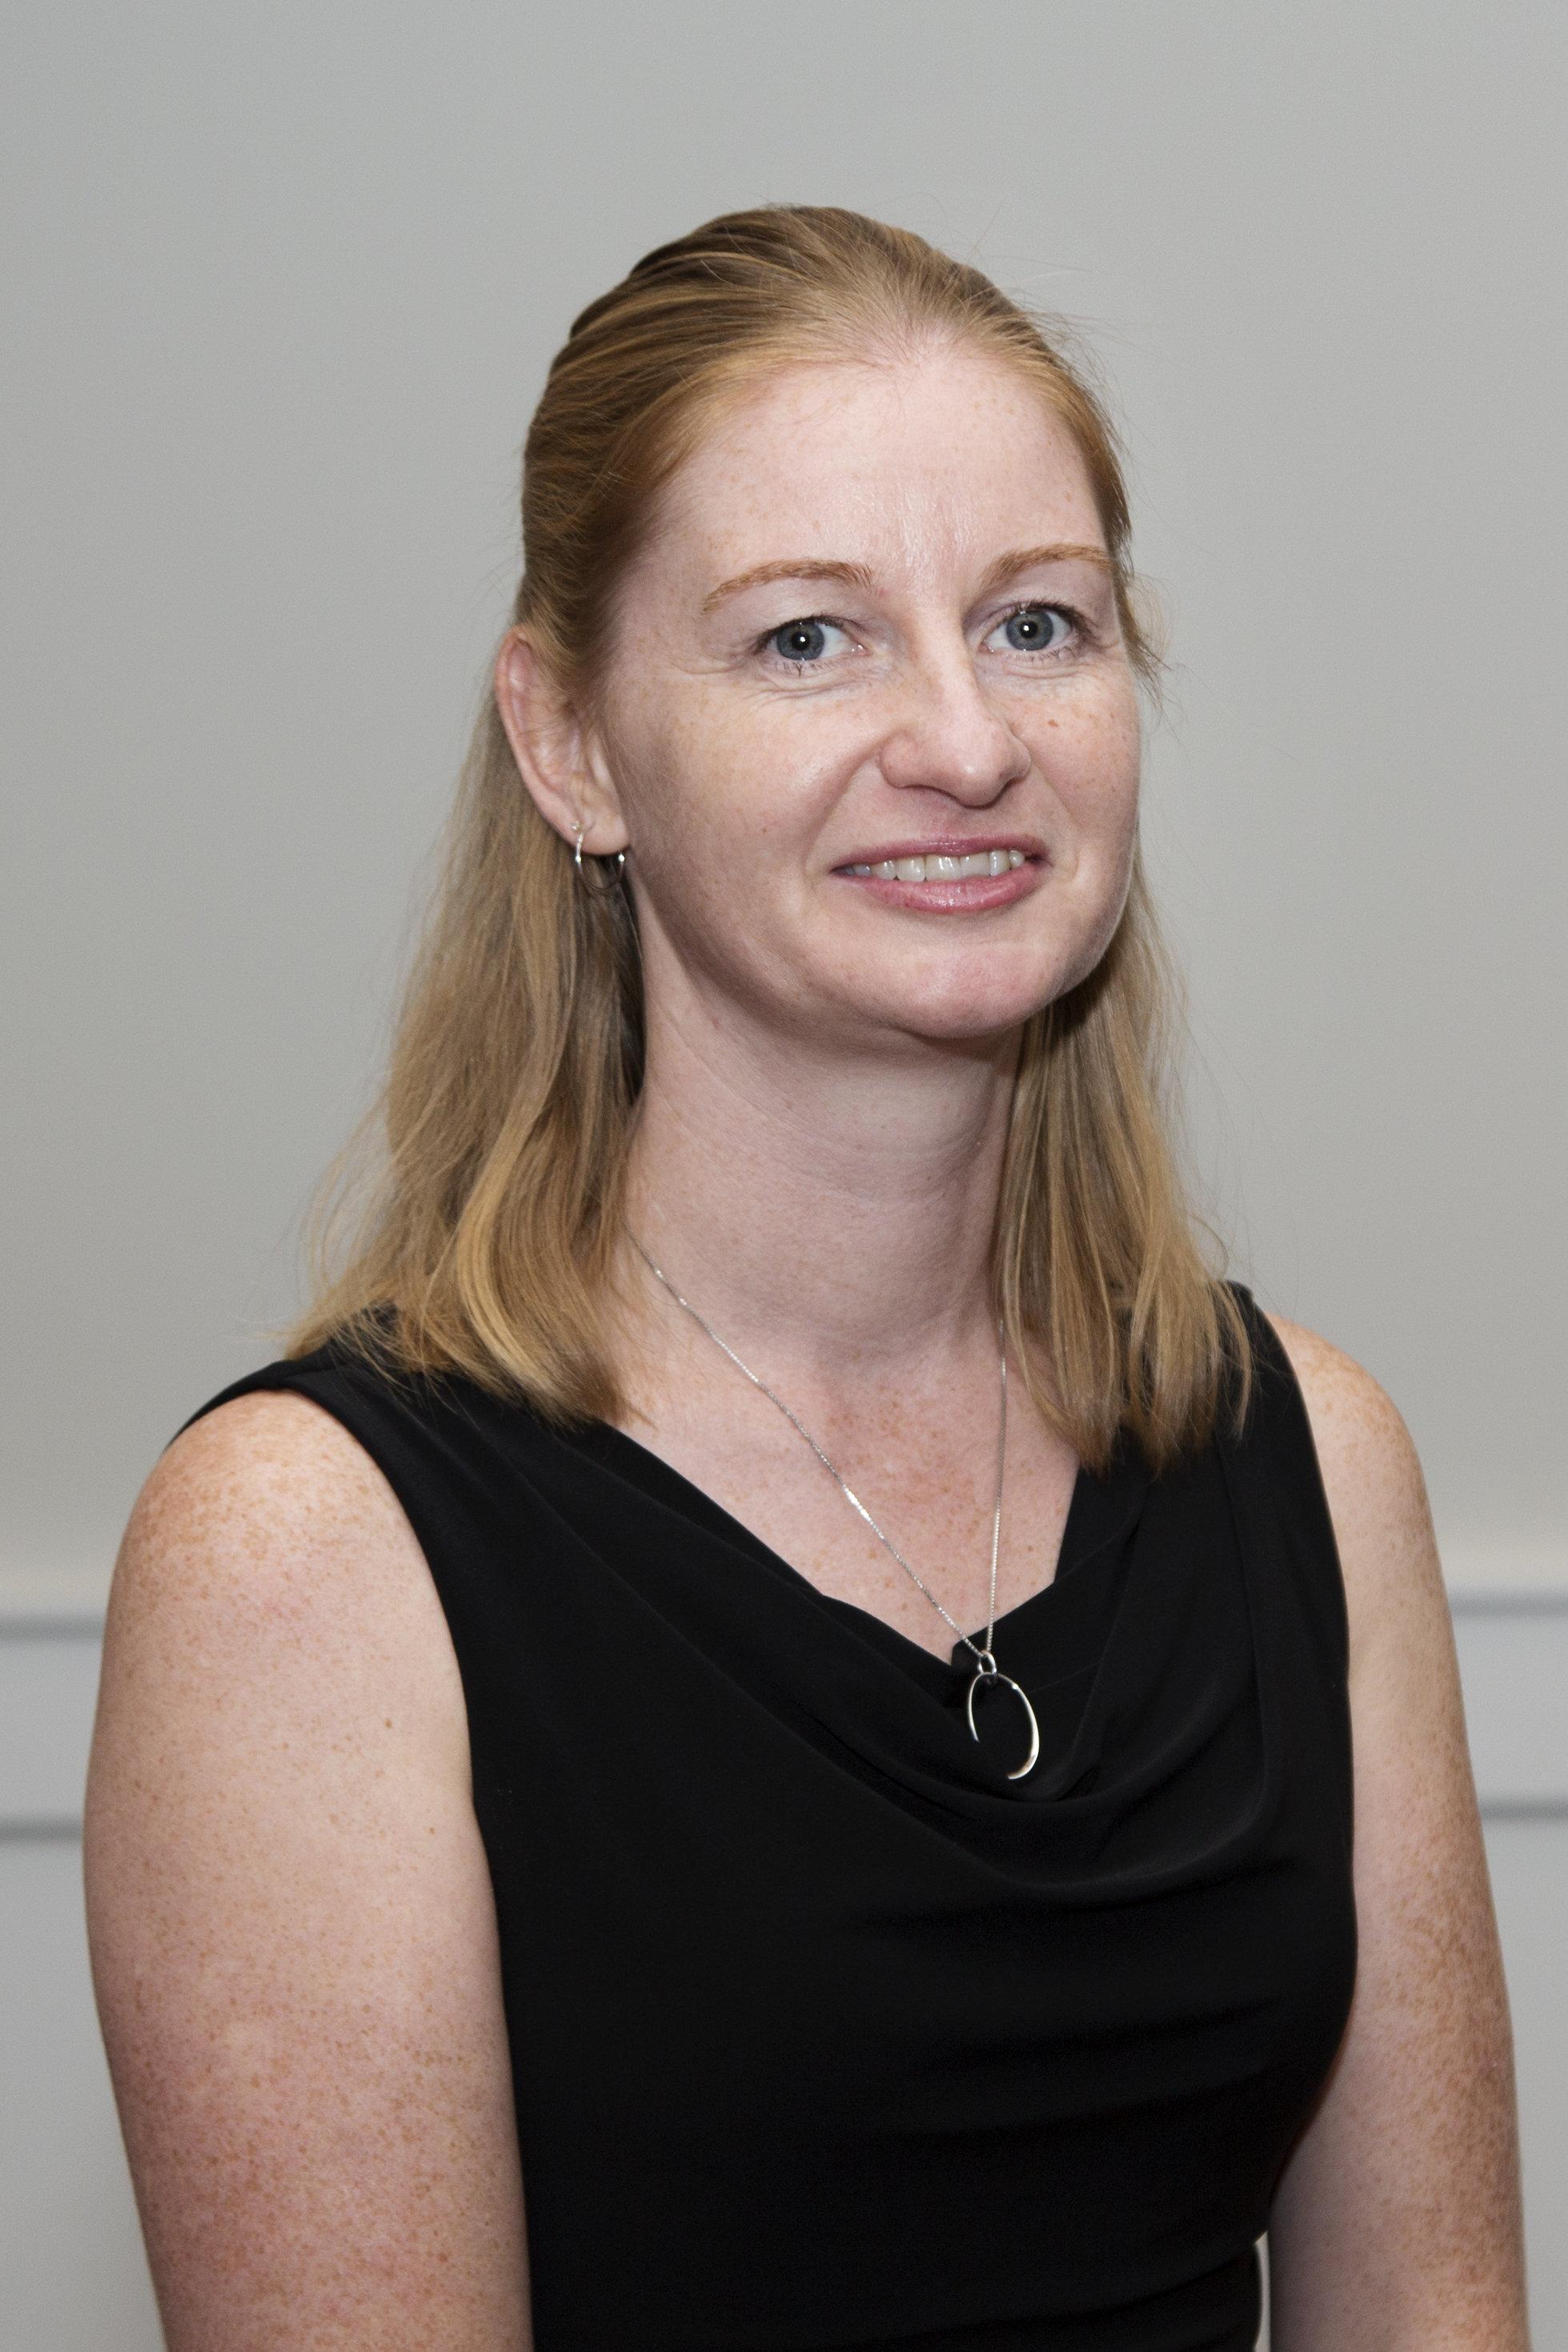 Julie McLinchey